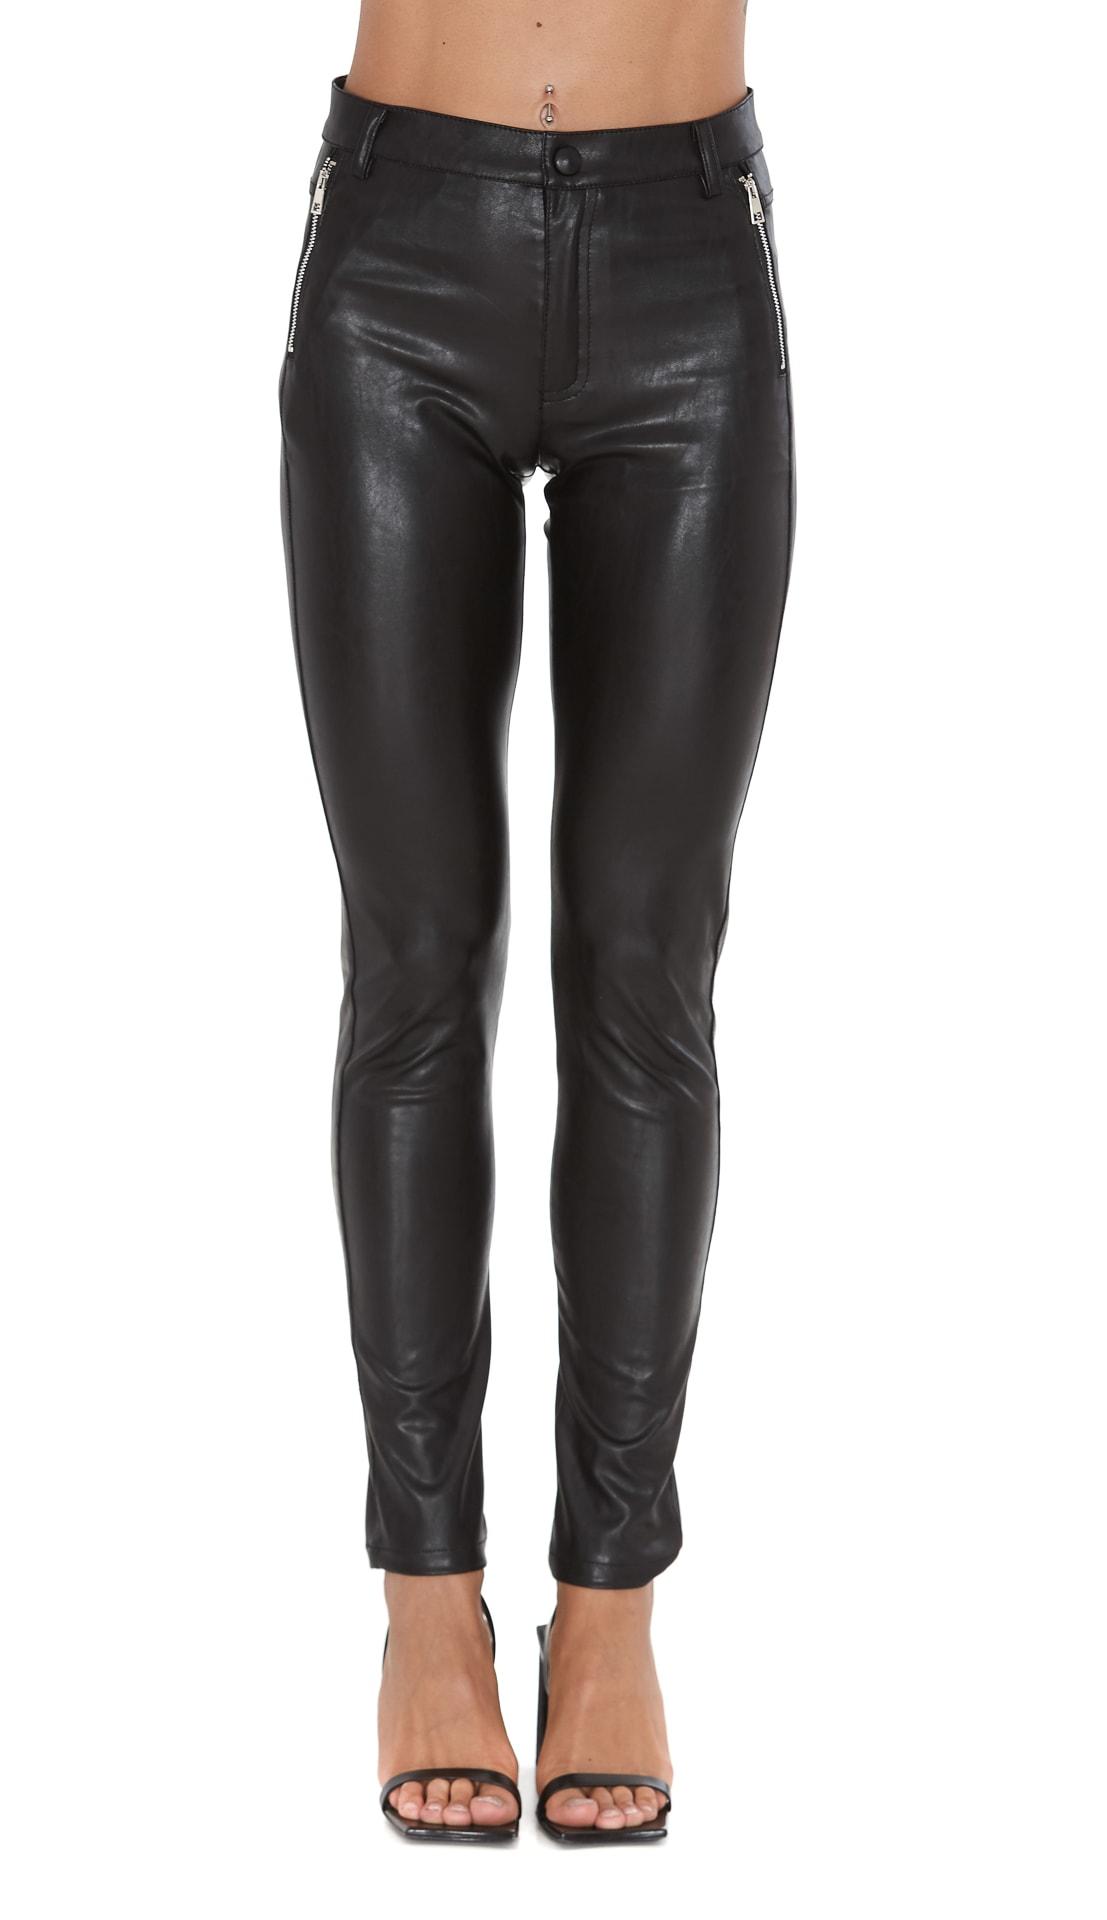 Aniye By Faux Leather Leggings